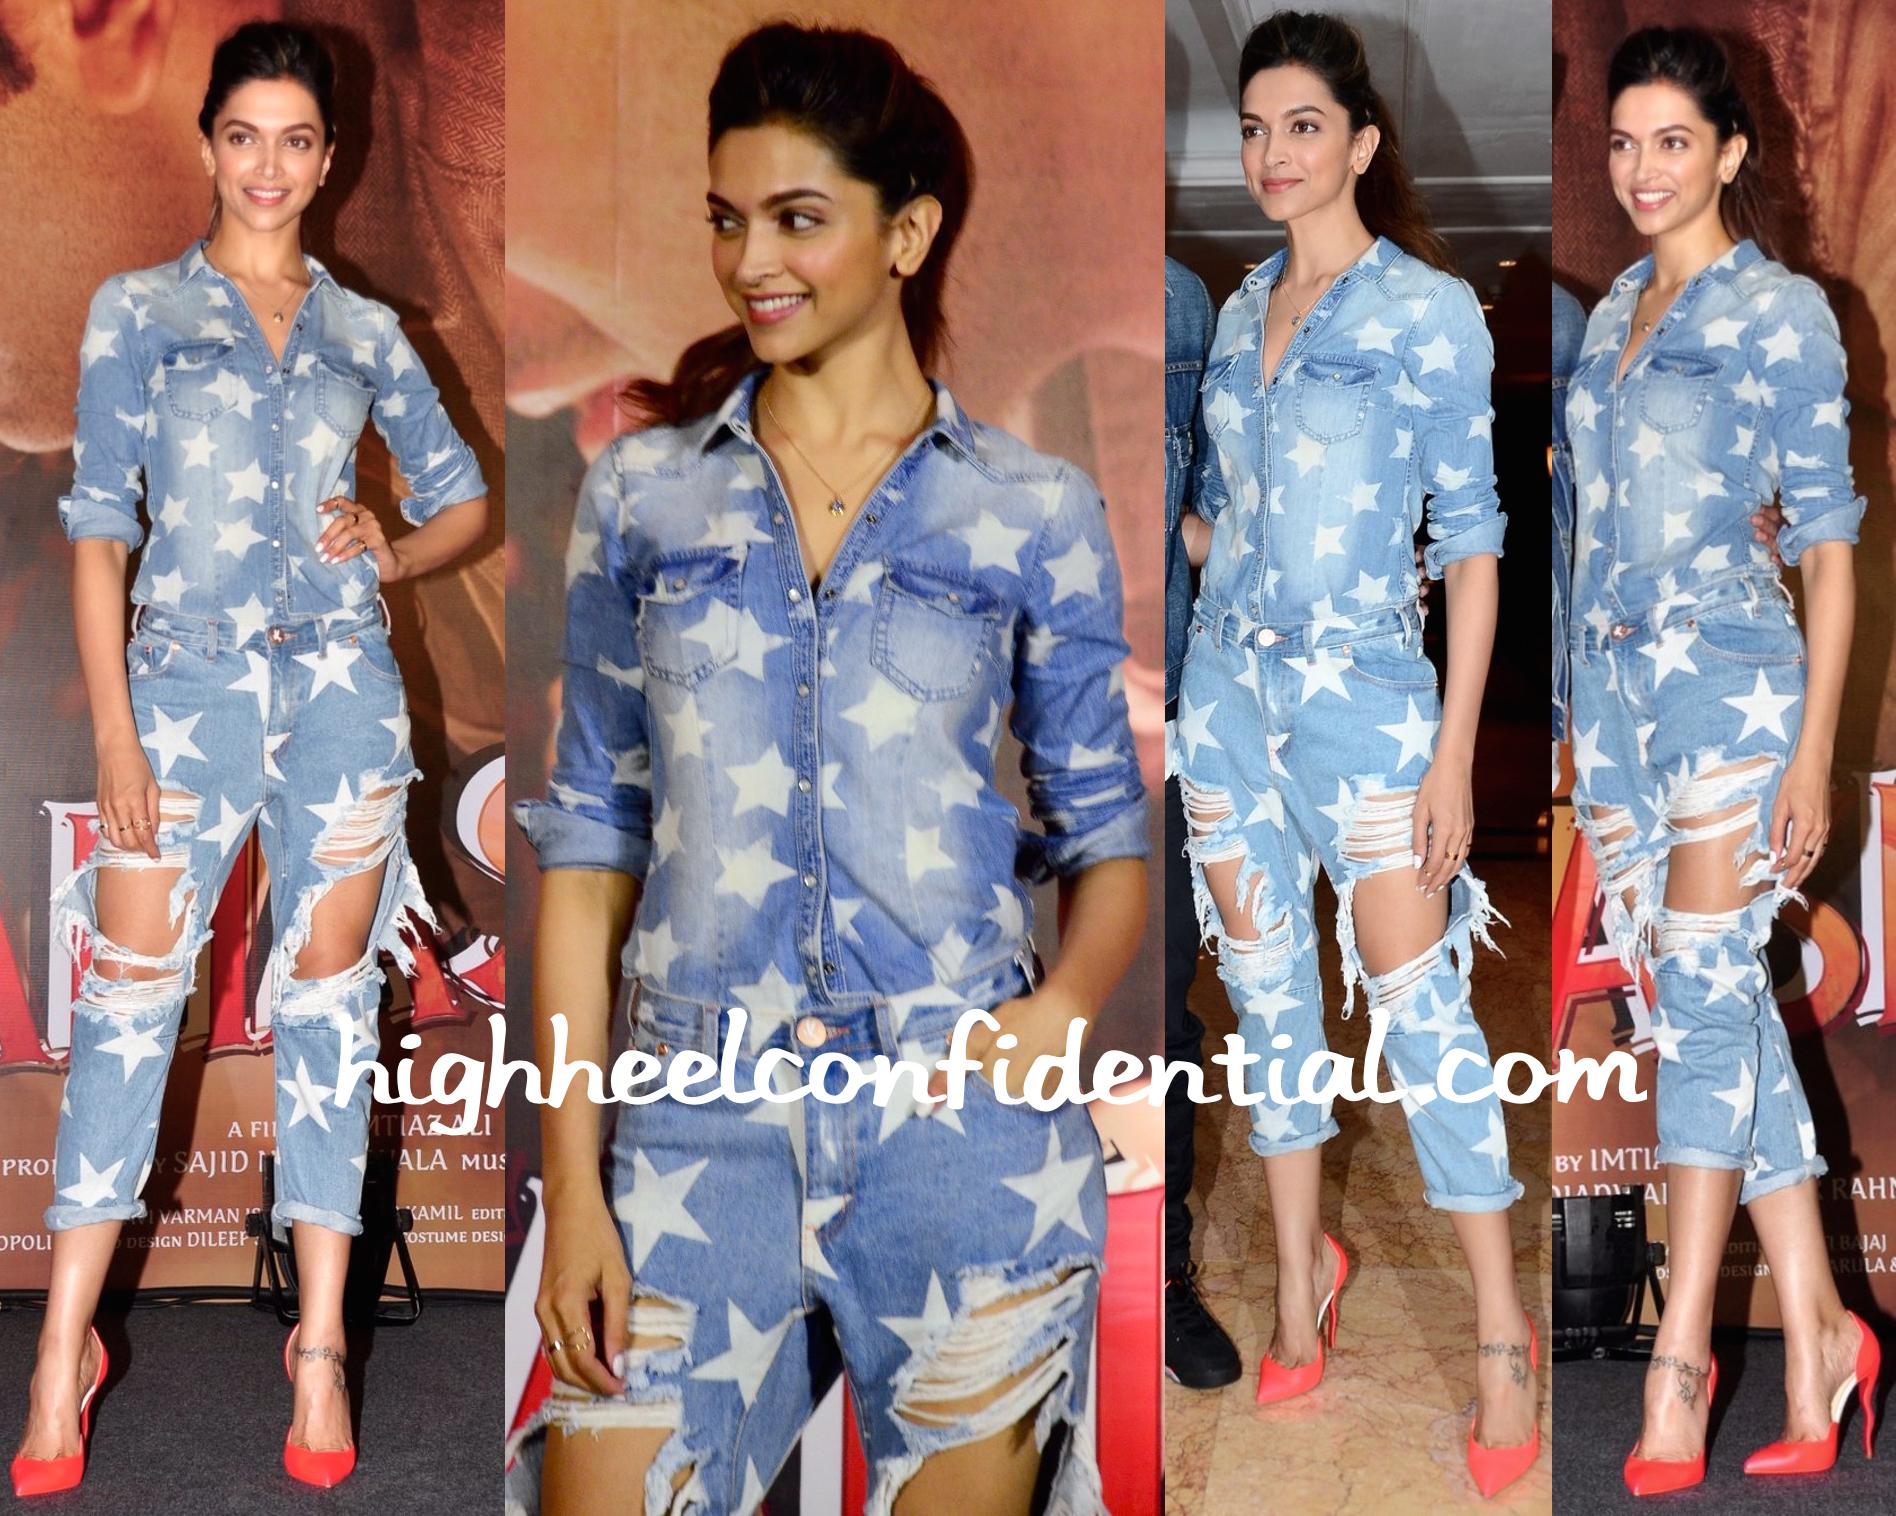 Deepika Padukone Tamasha Clothing - Deepika Padukone Age